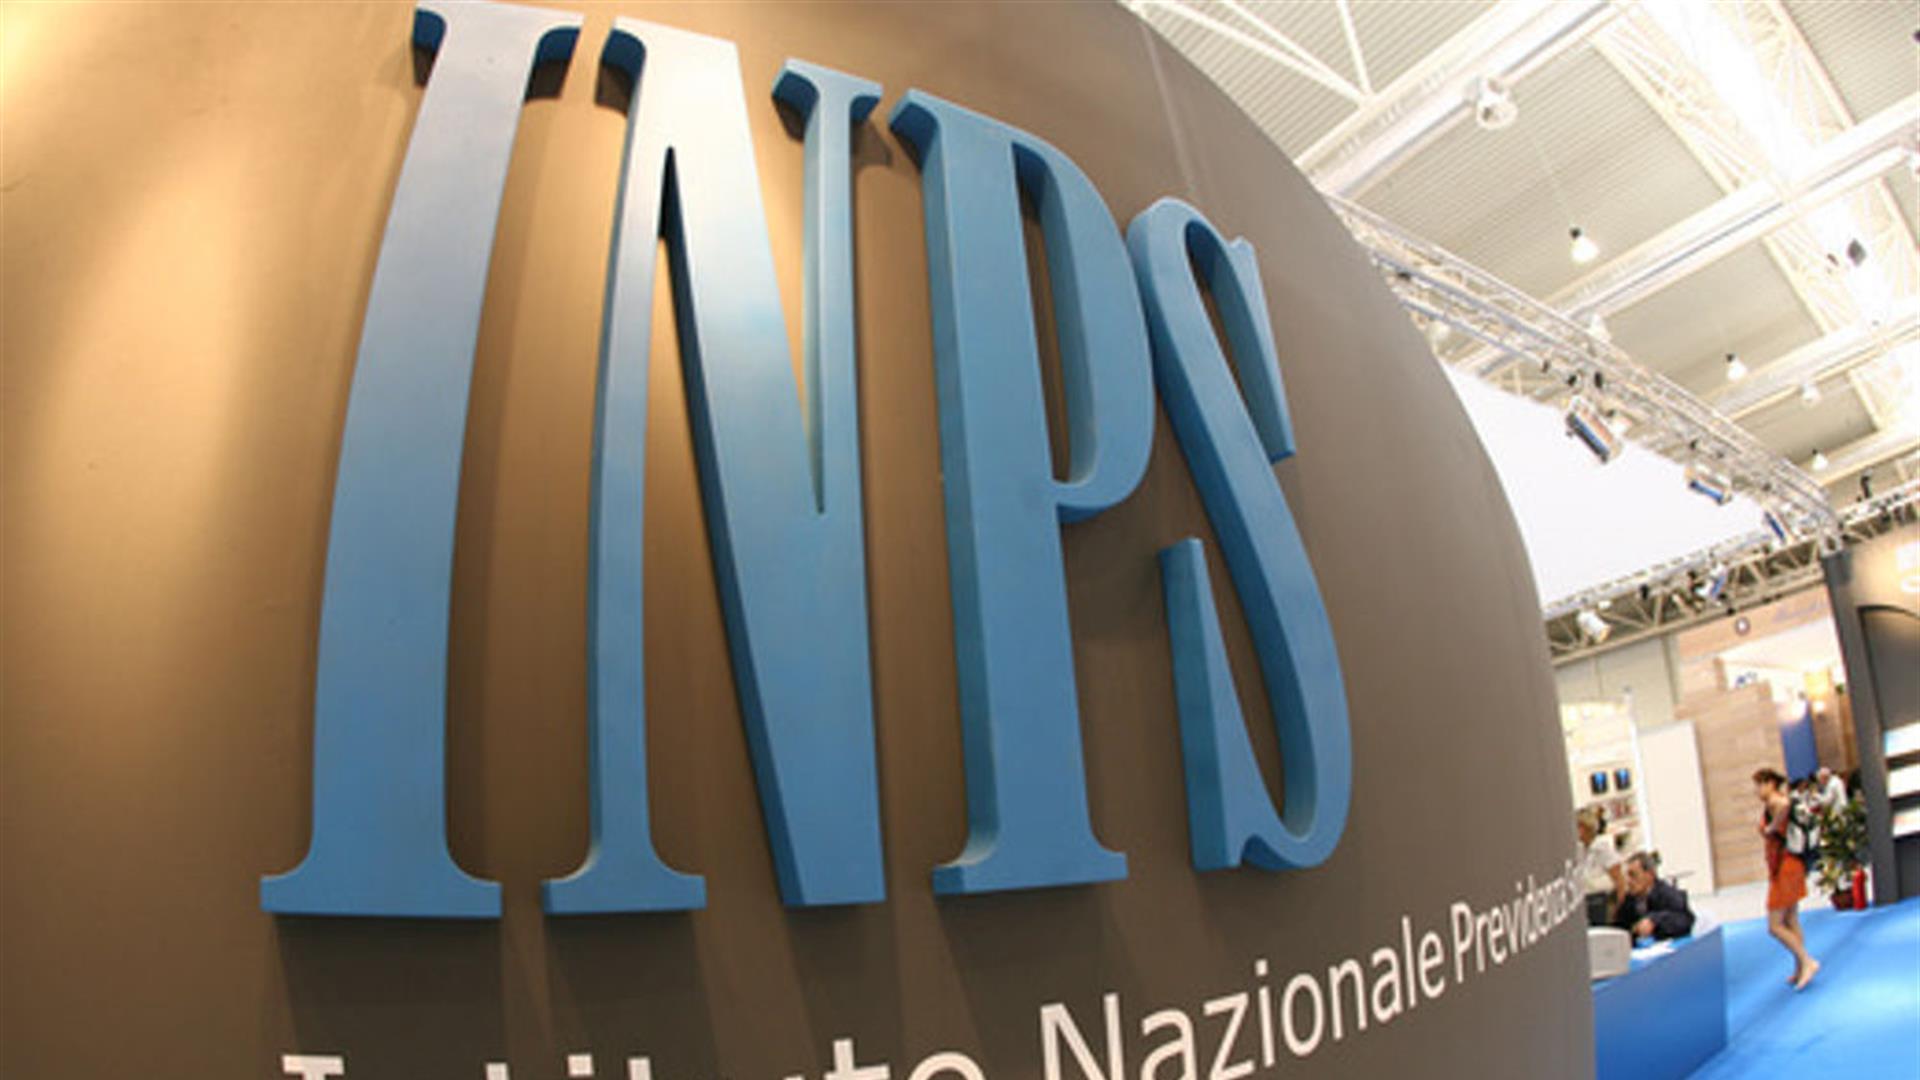 inps pin